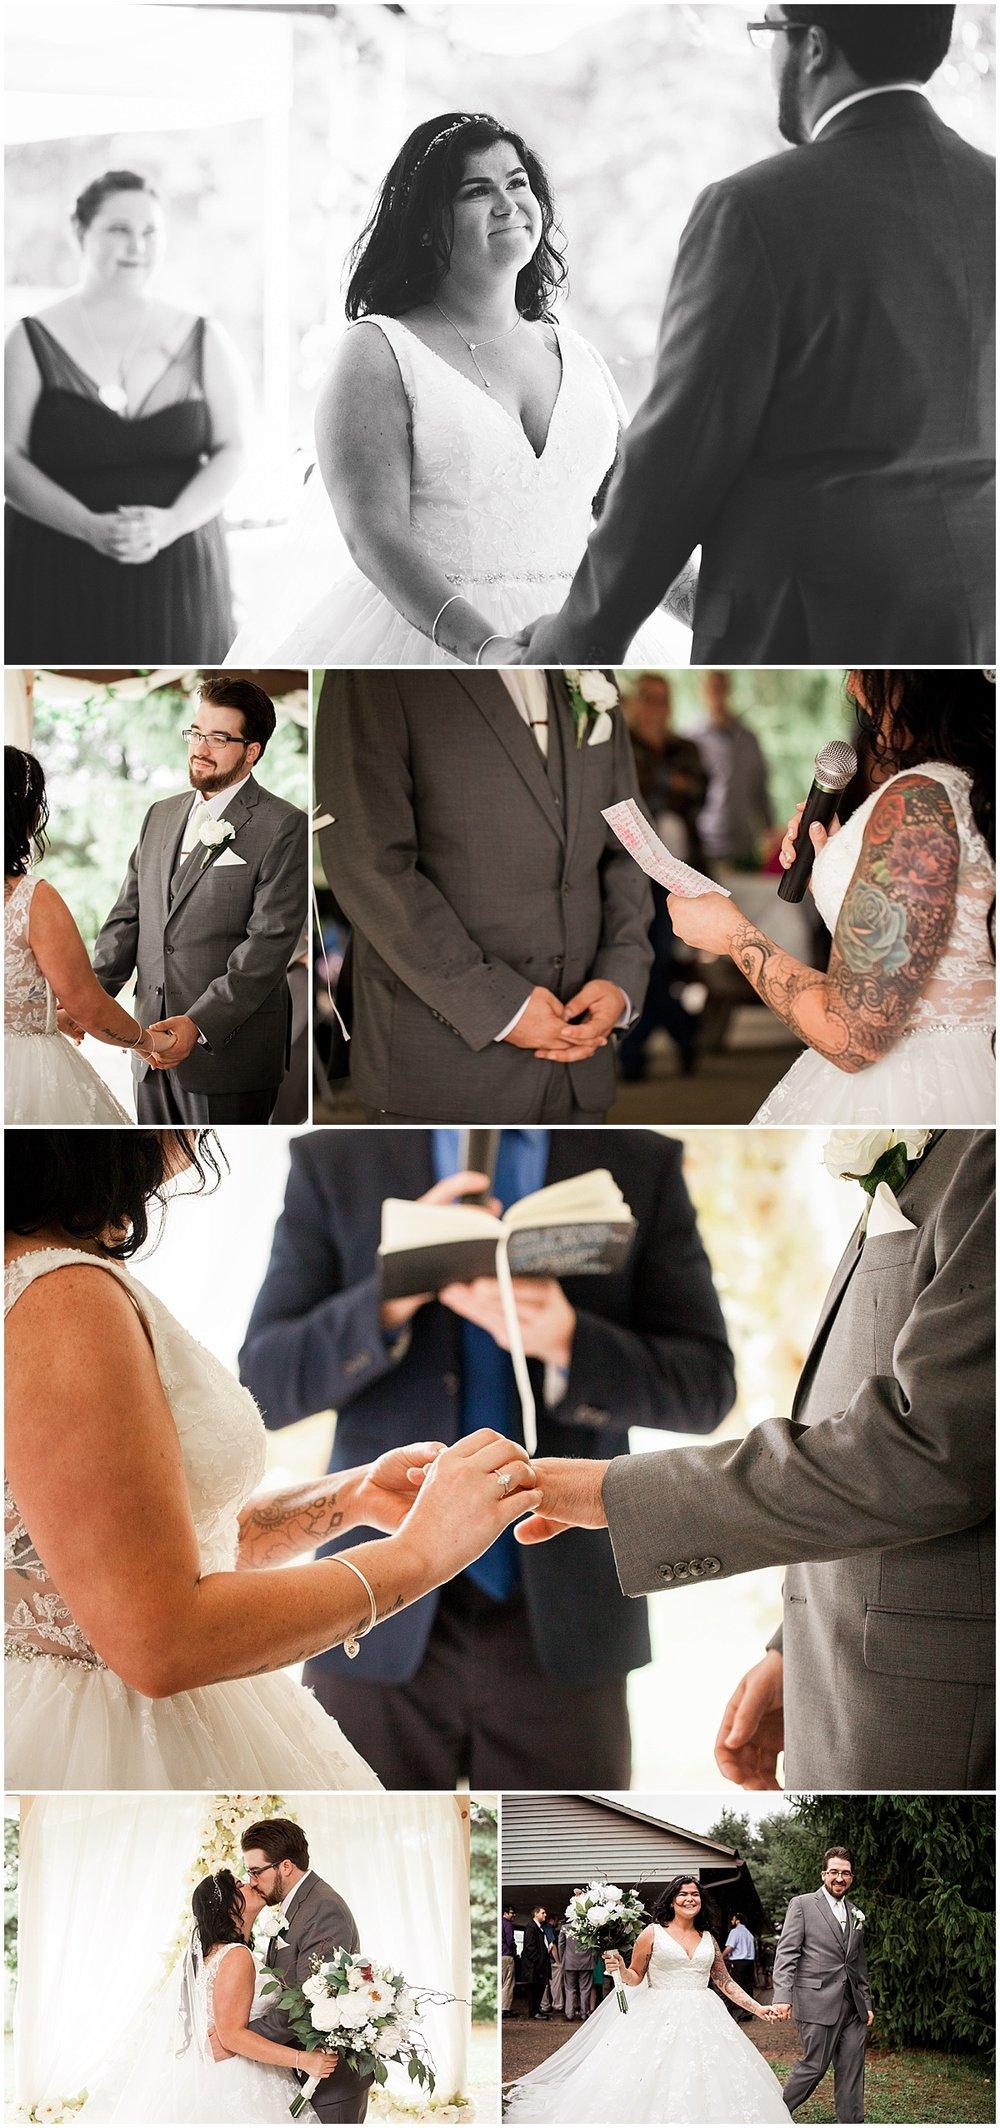 pittsburgh pa wedding ceremony photographer